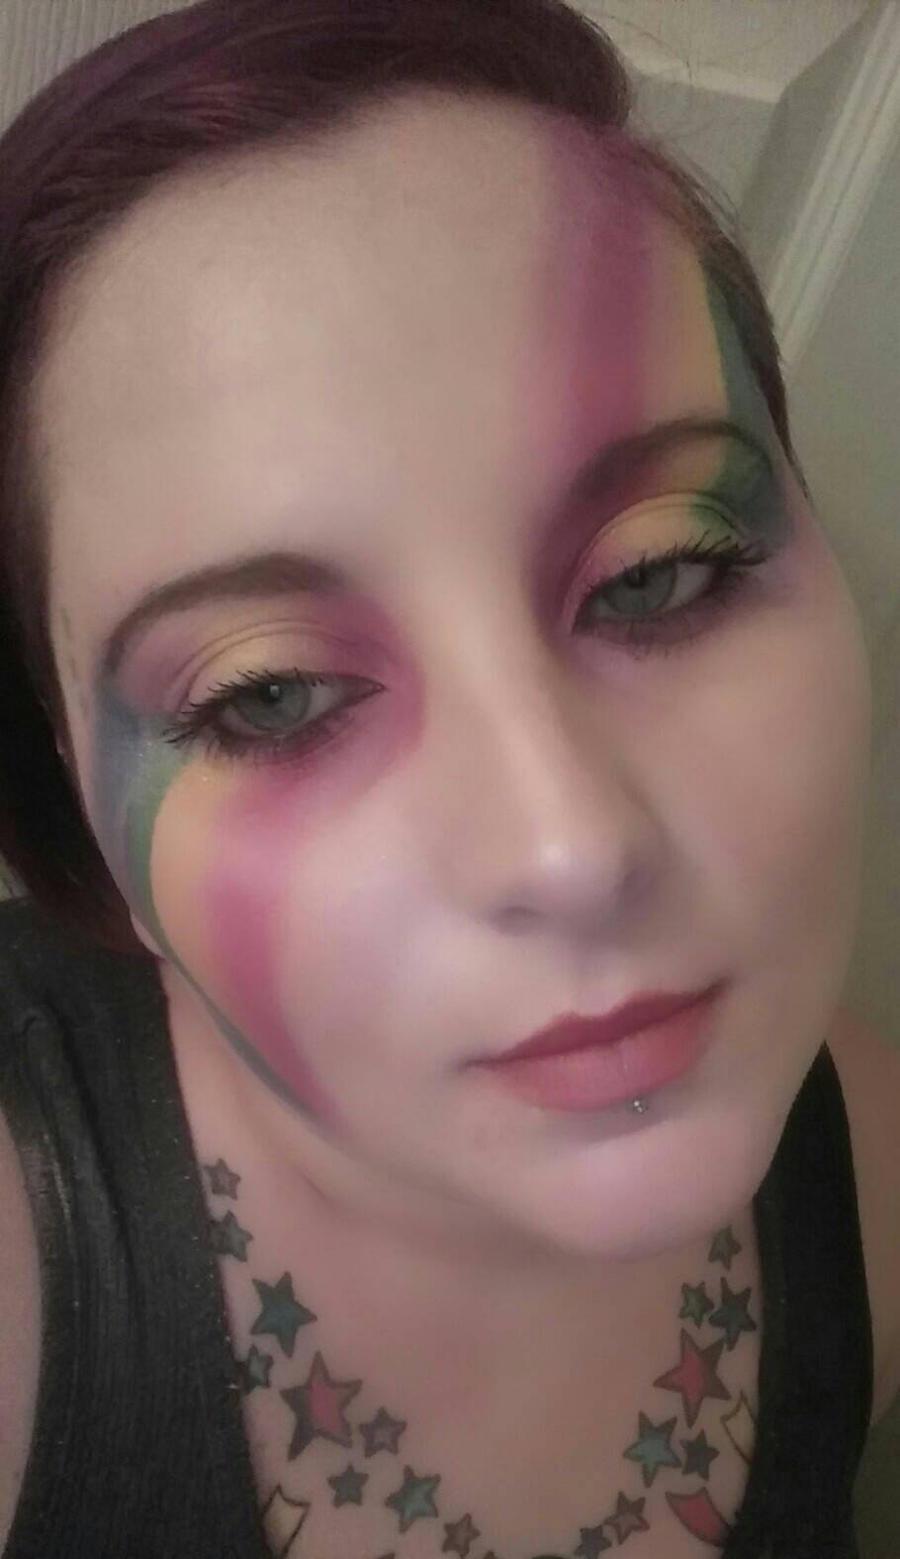 LGBTQ+/PRIDE make-up two